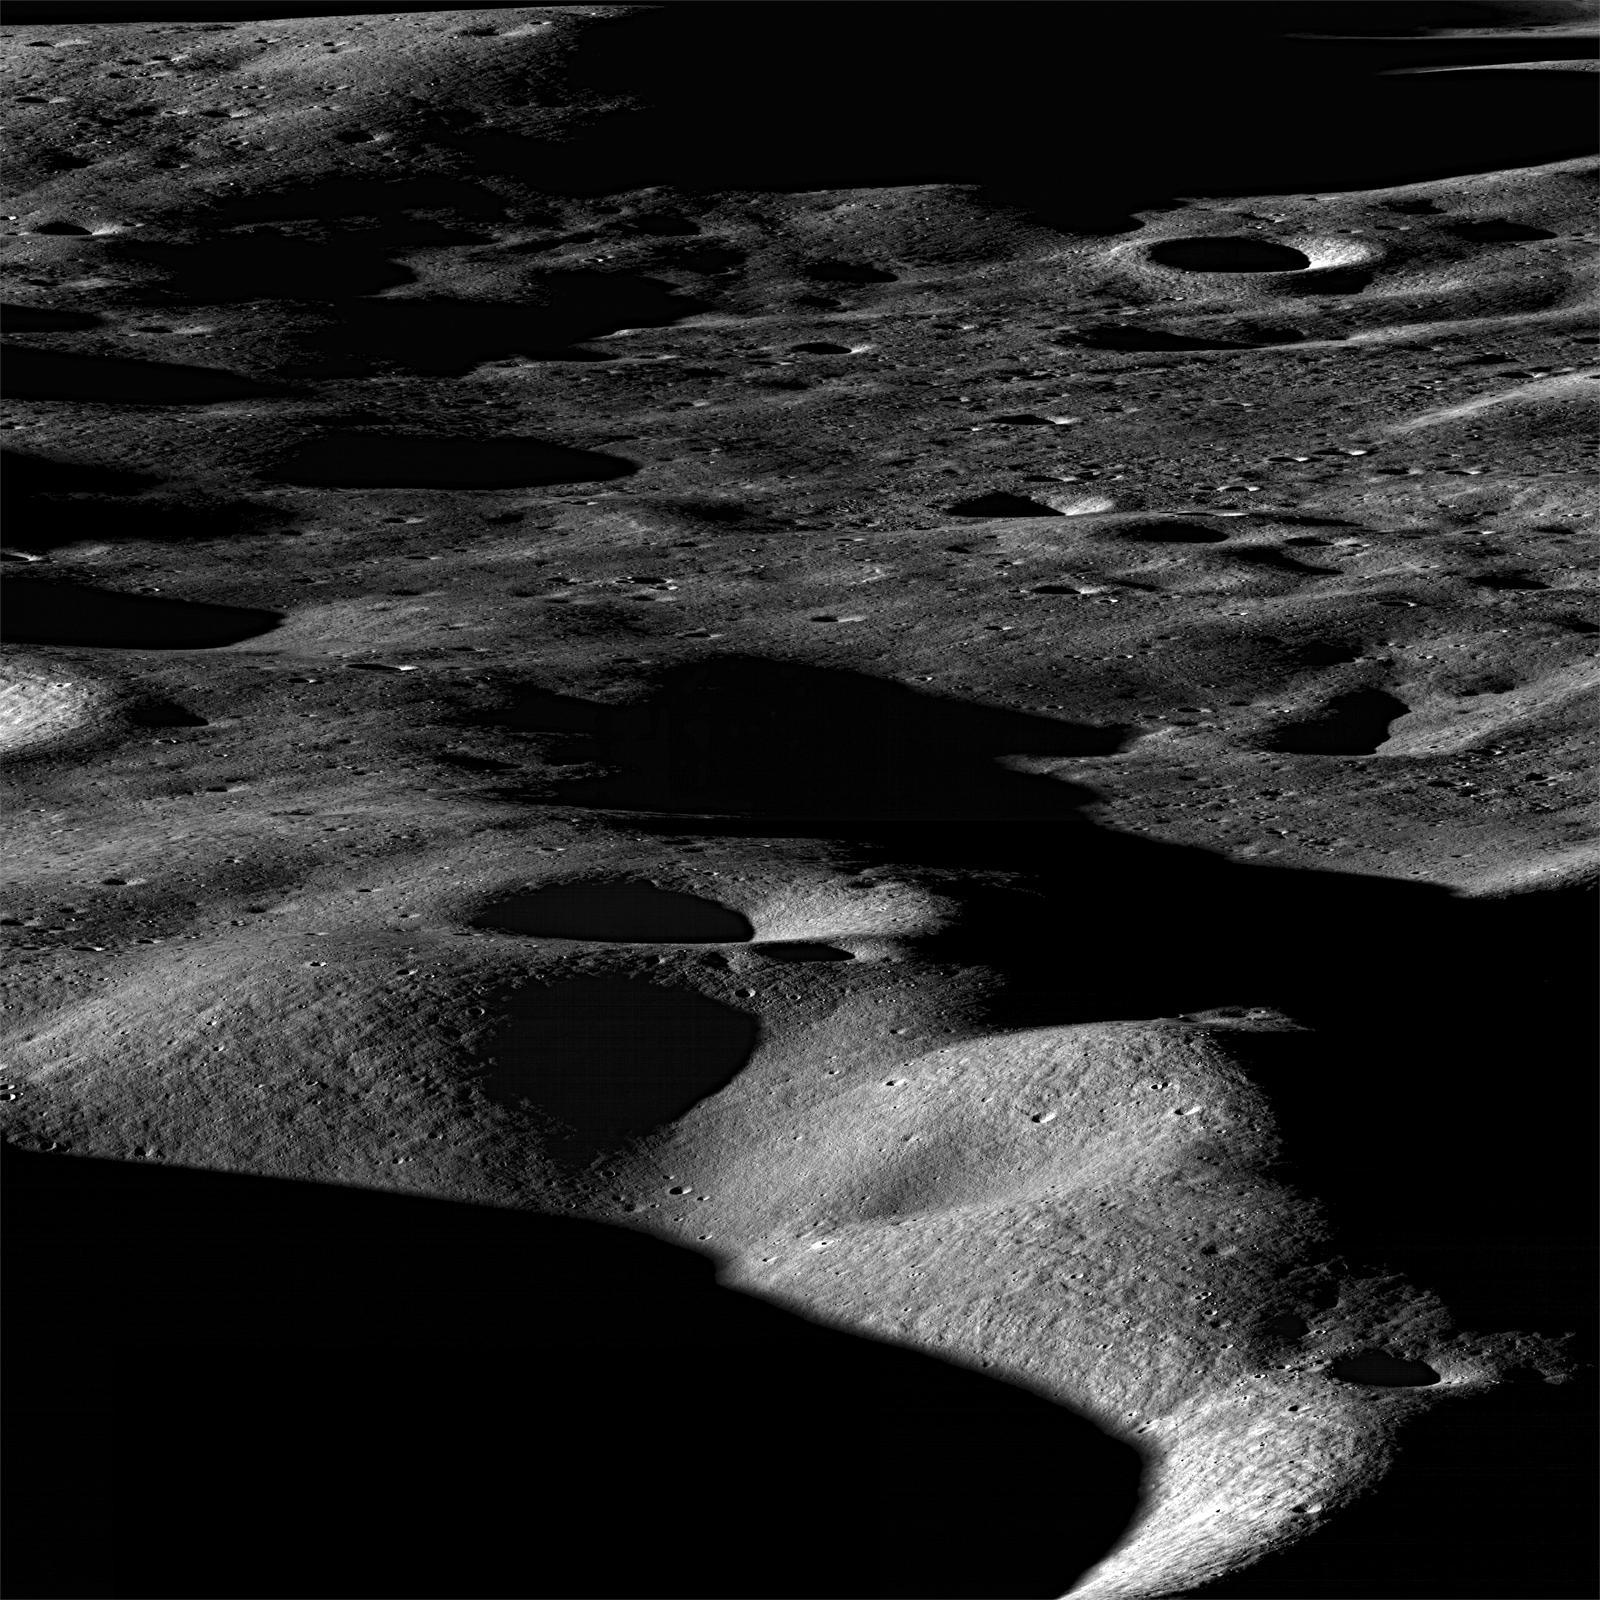 Mountains of the Moon. Image credit: NASA/GSFC/Arizona State University.